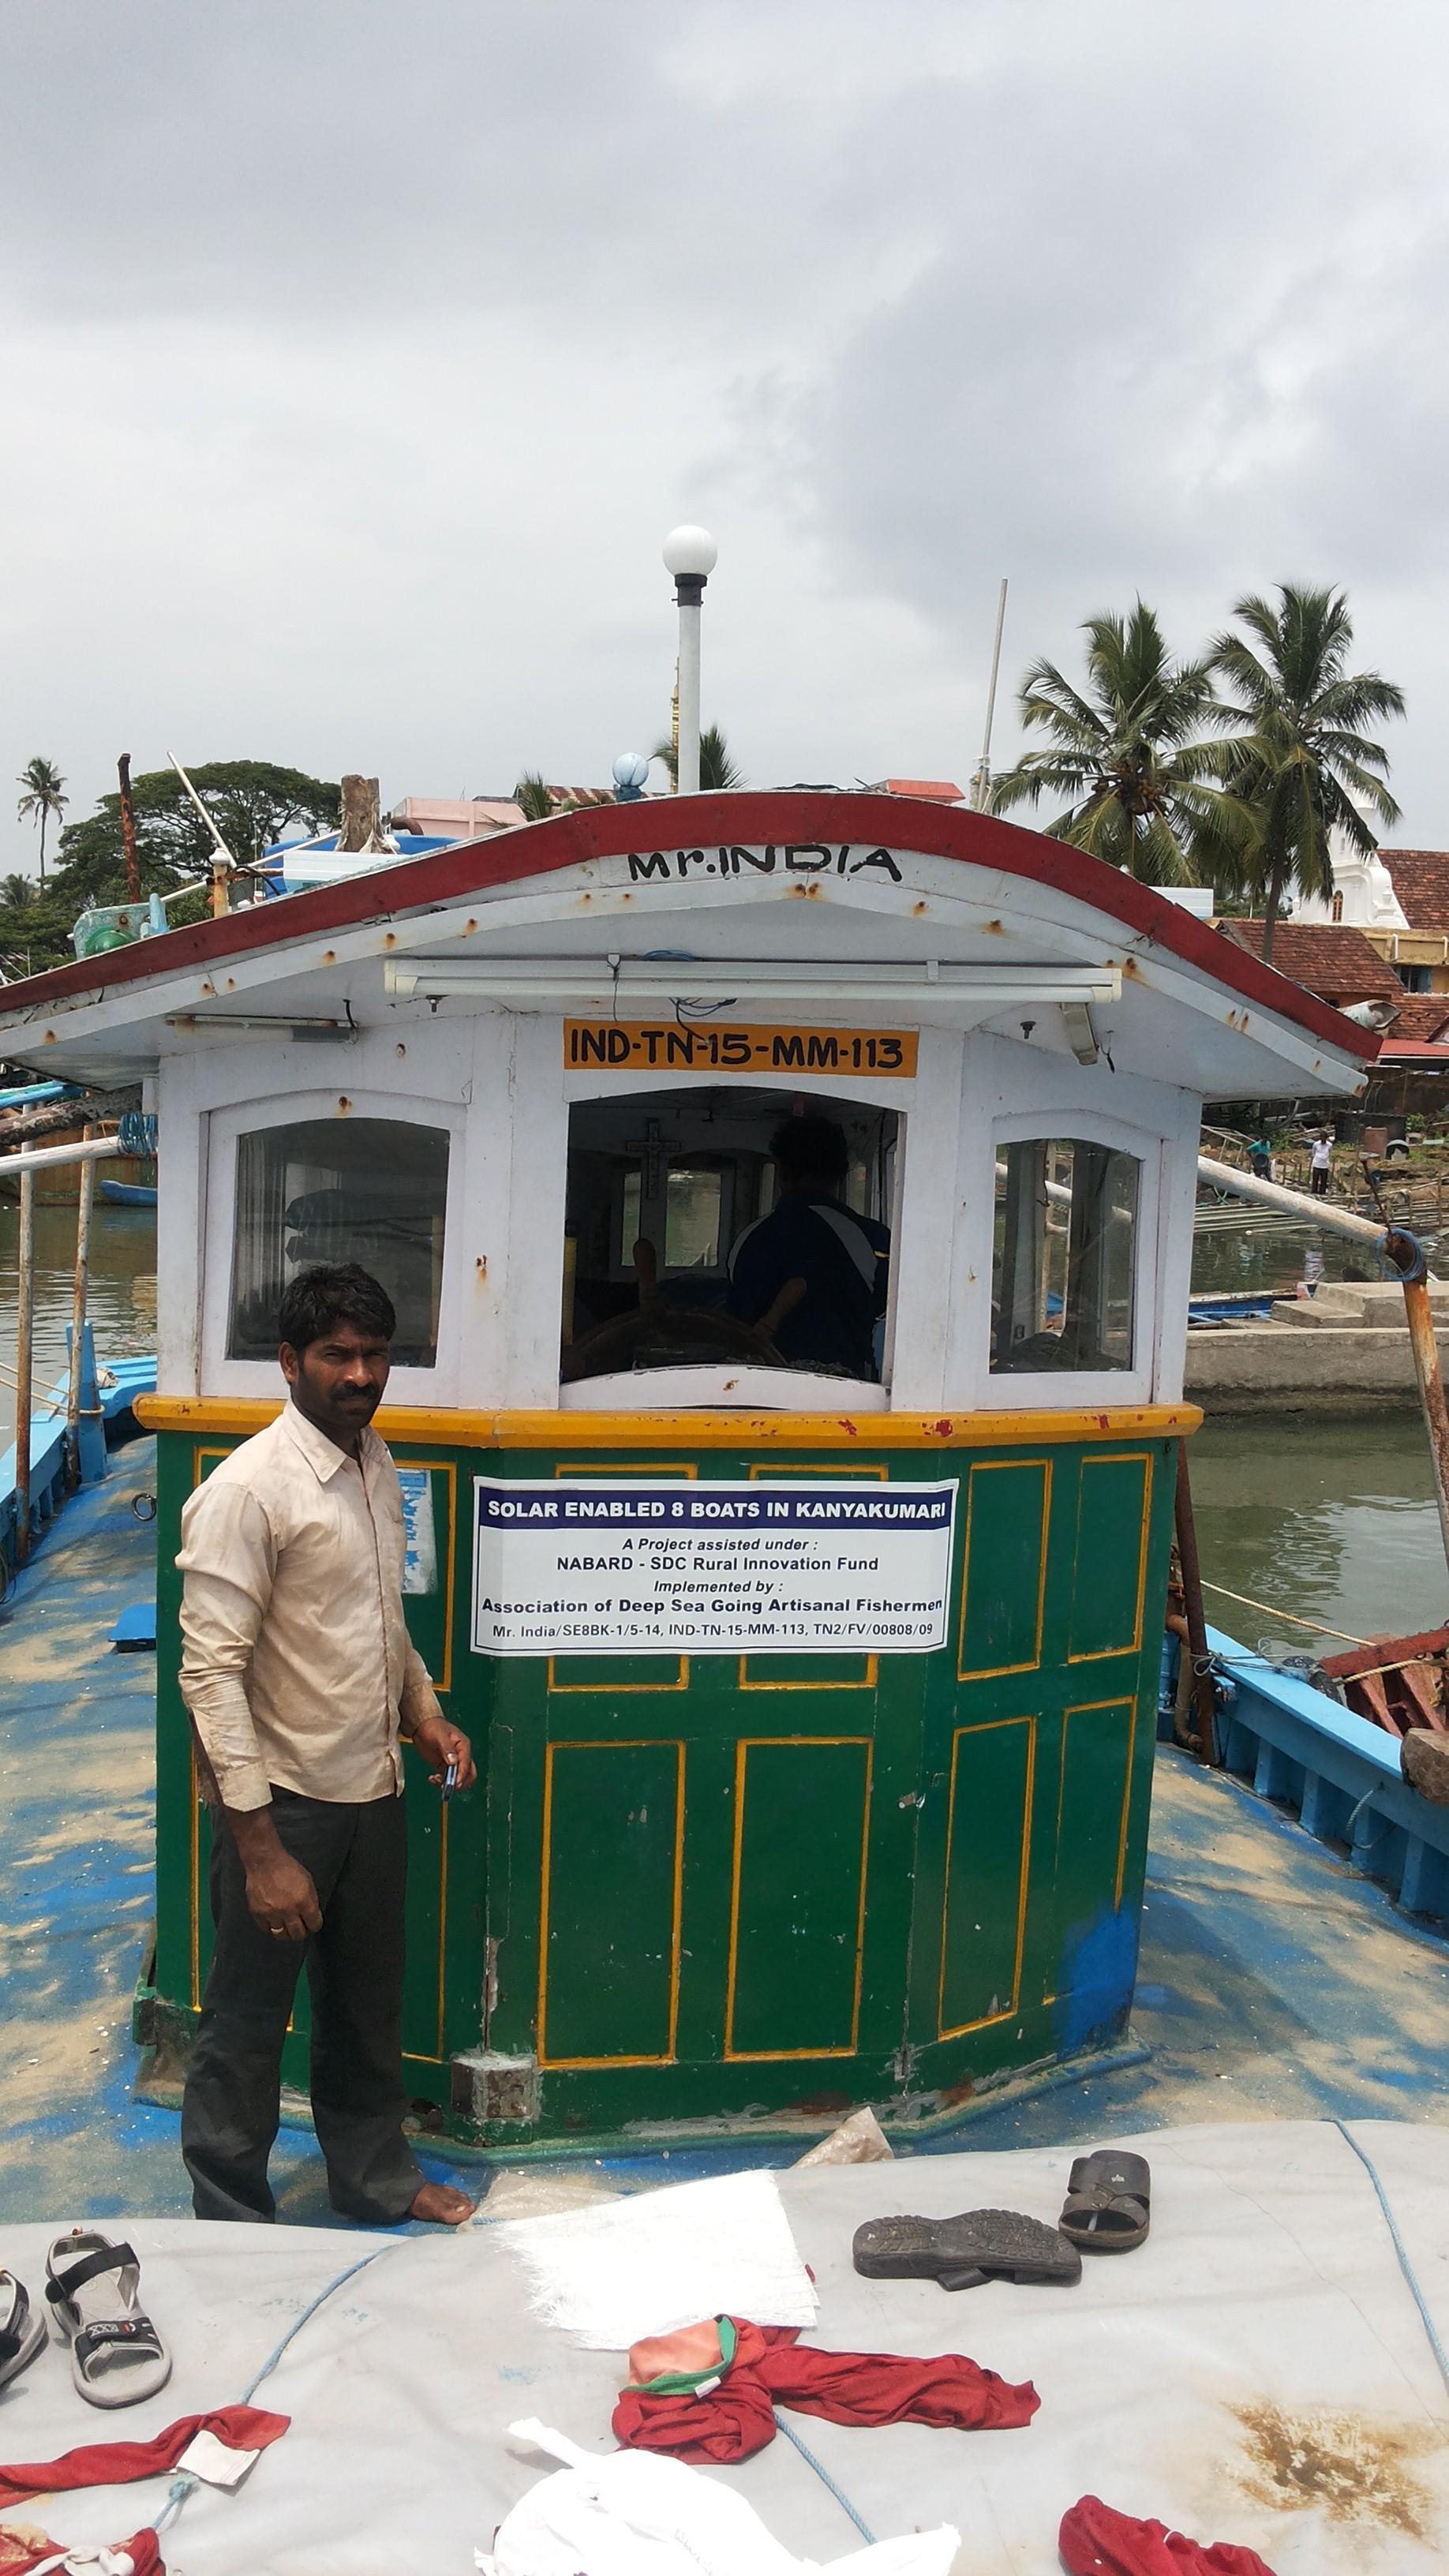 Partnership with NABARD | Association of Deep Sea Going